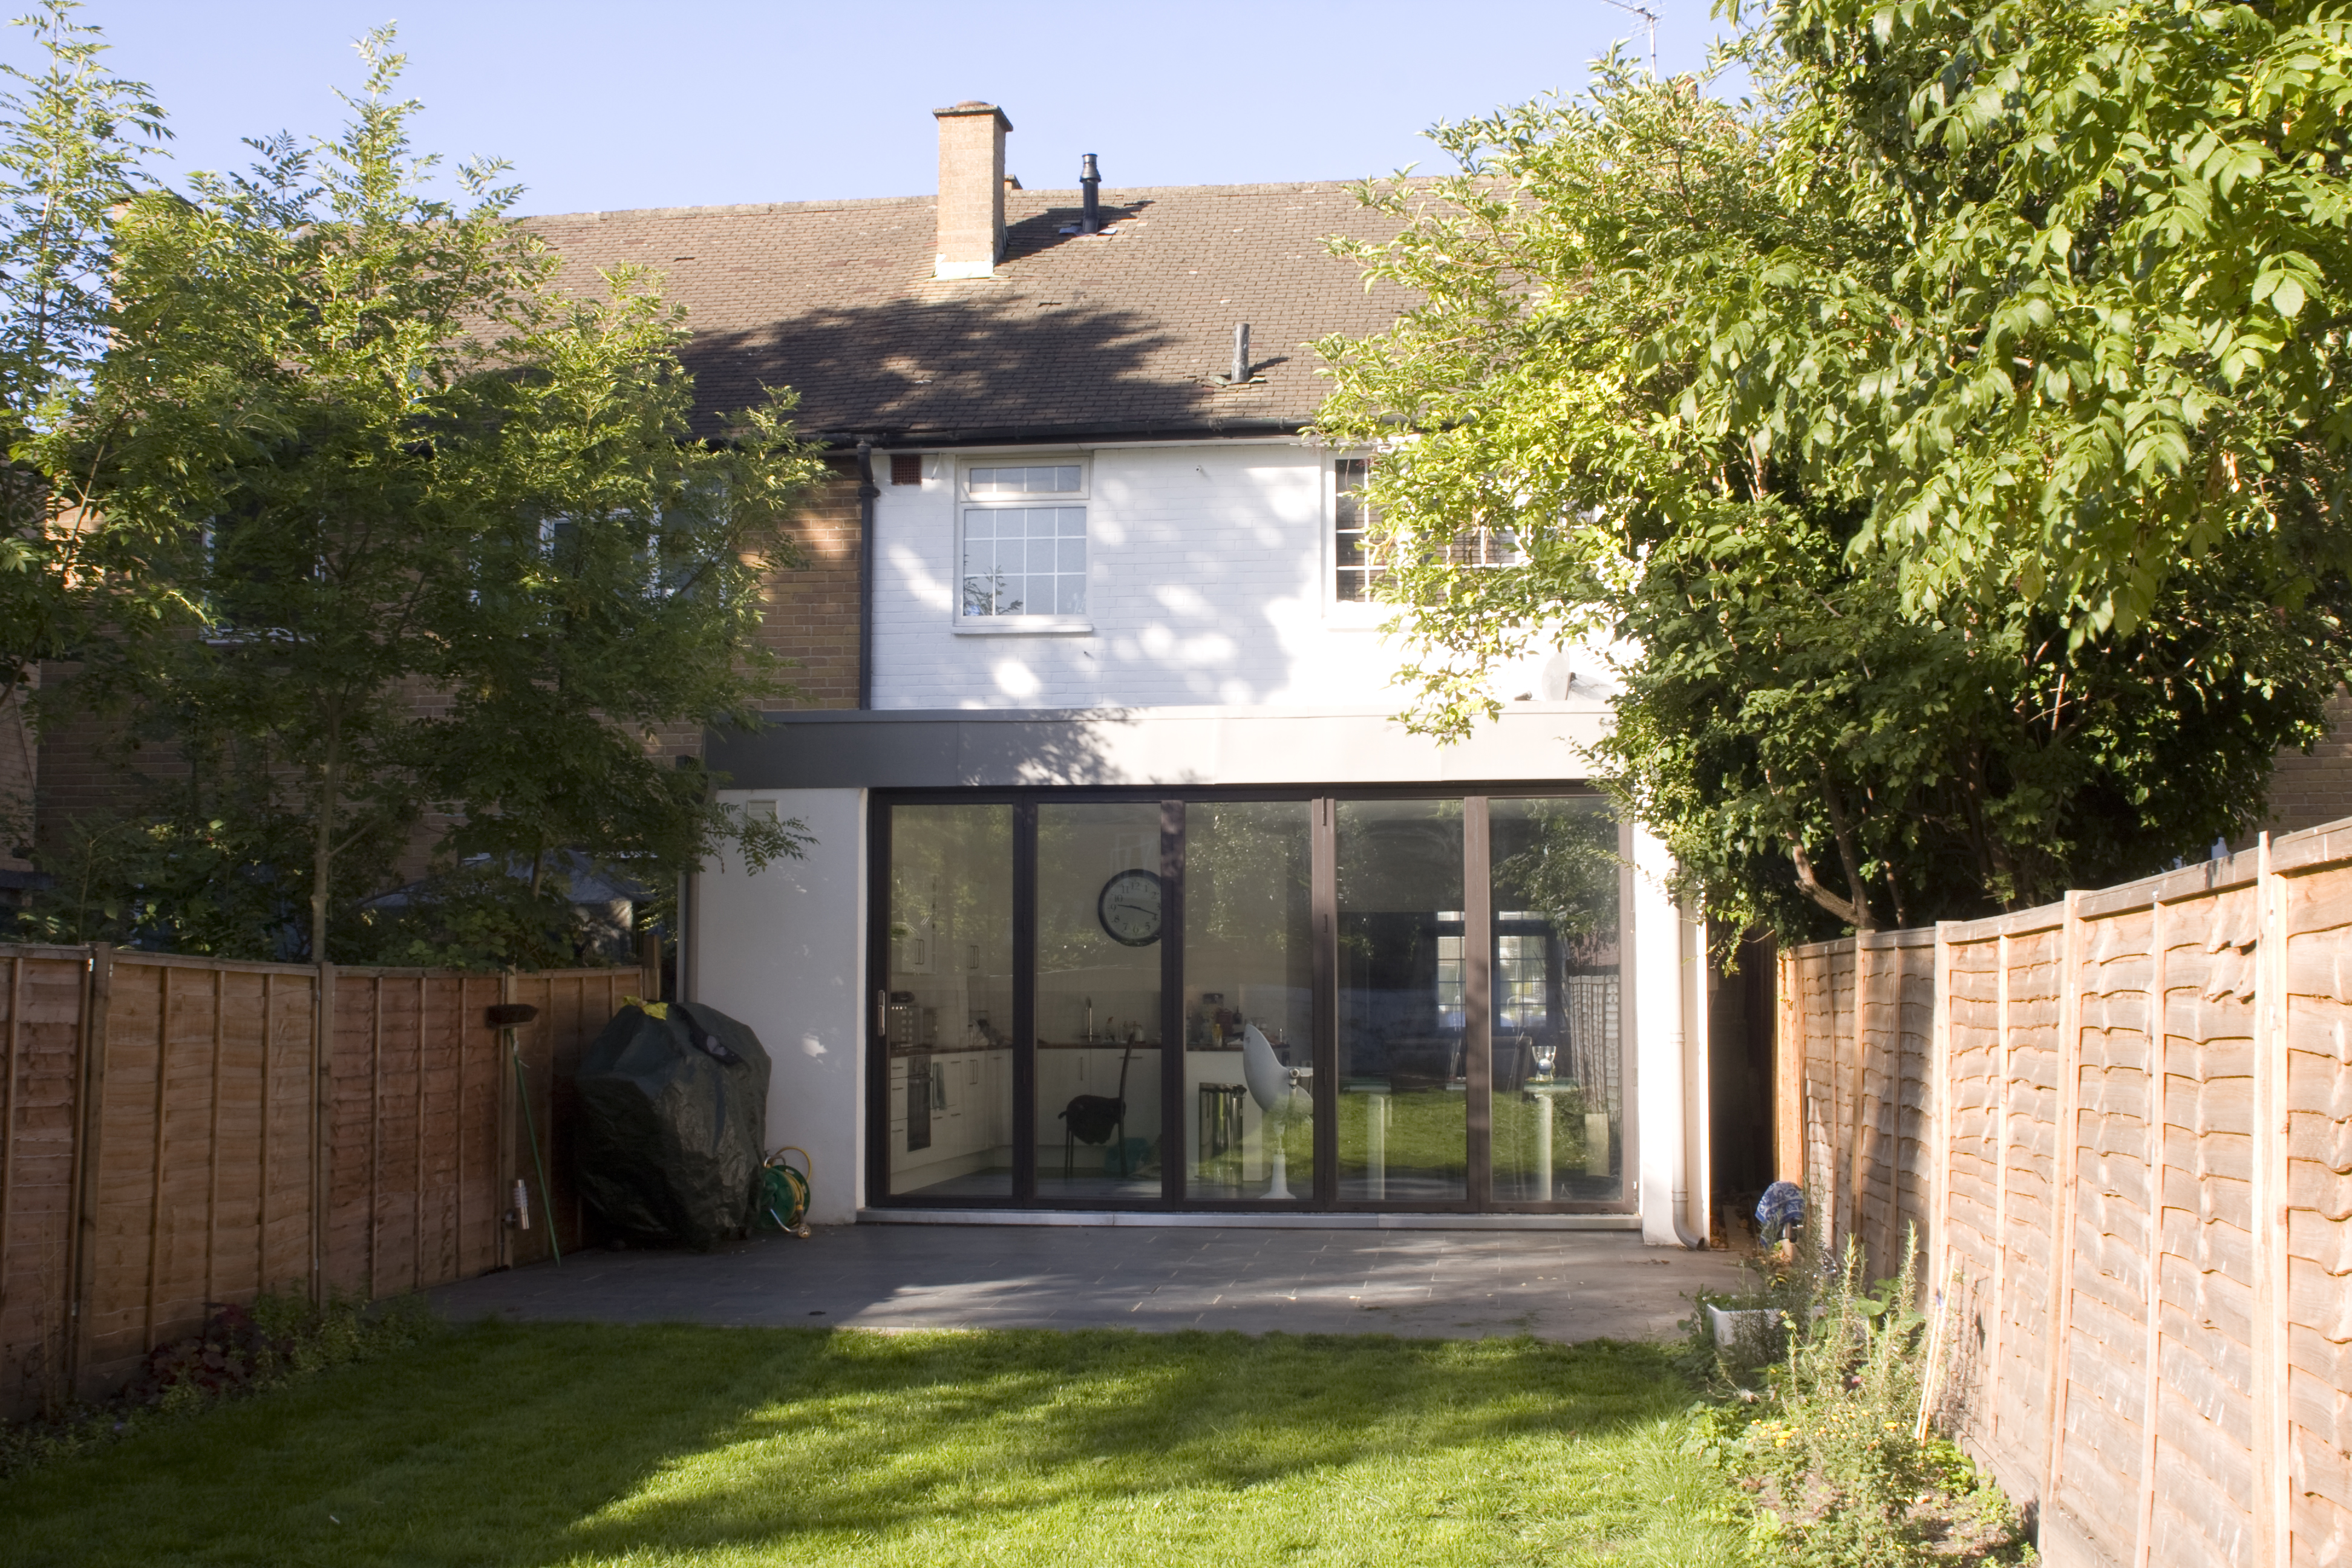 Architects Balham